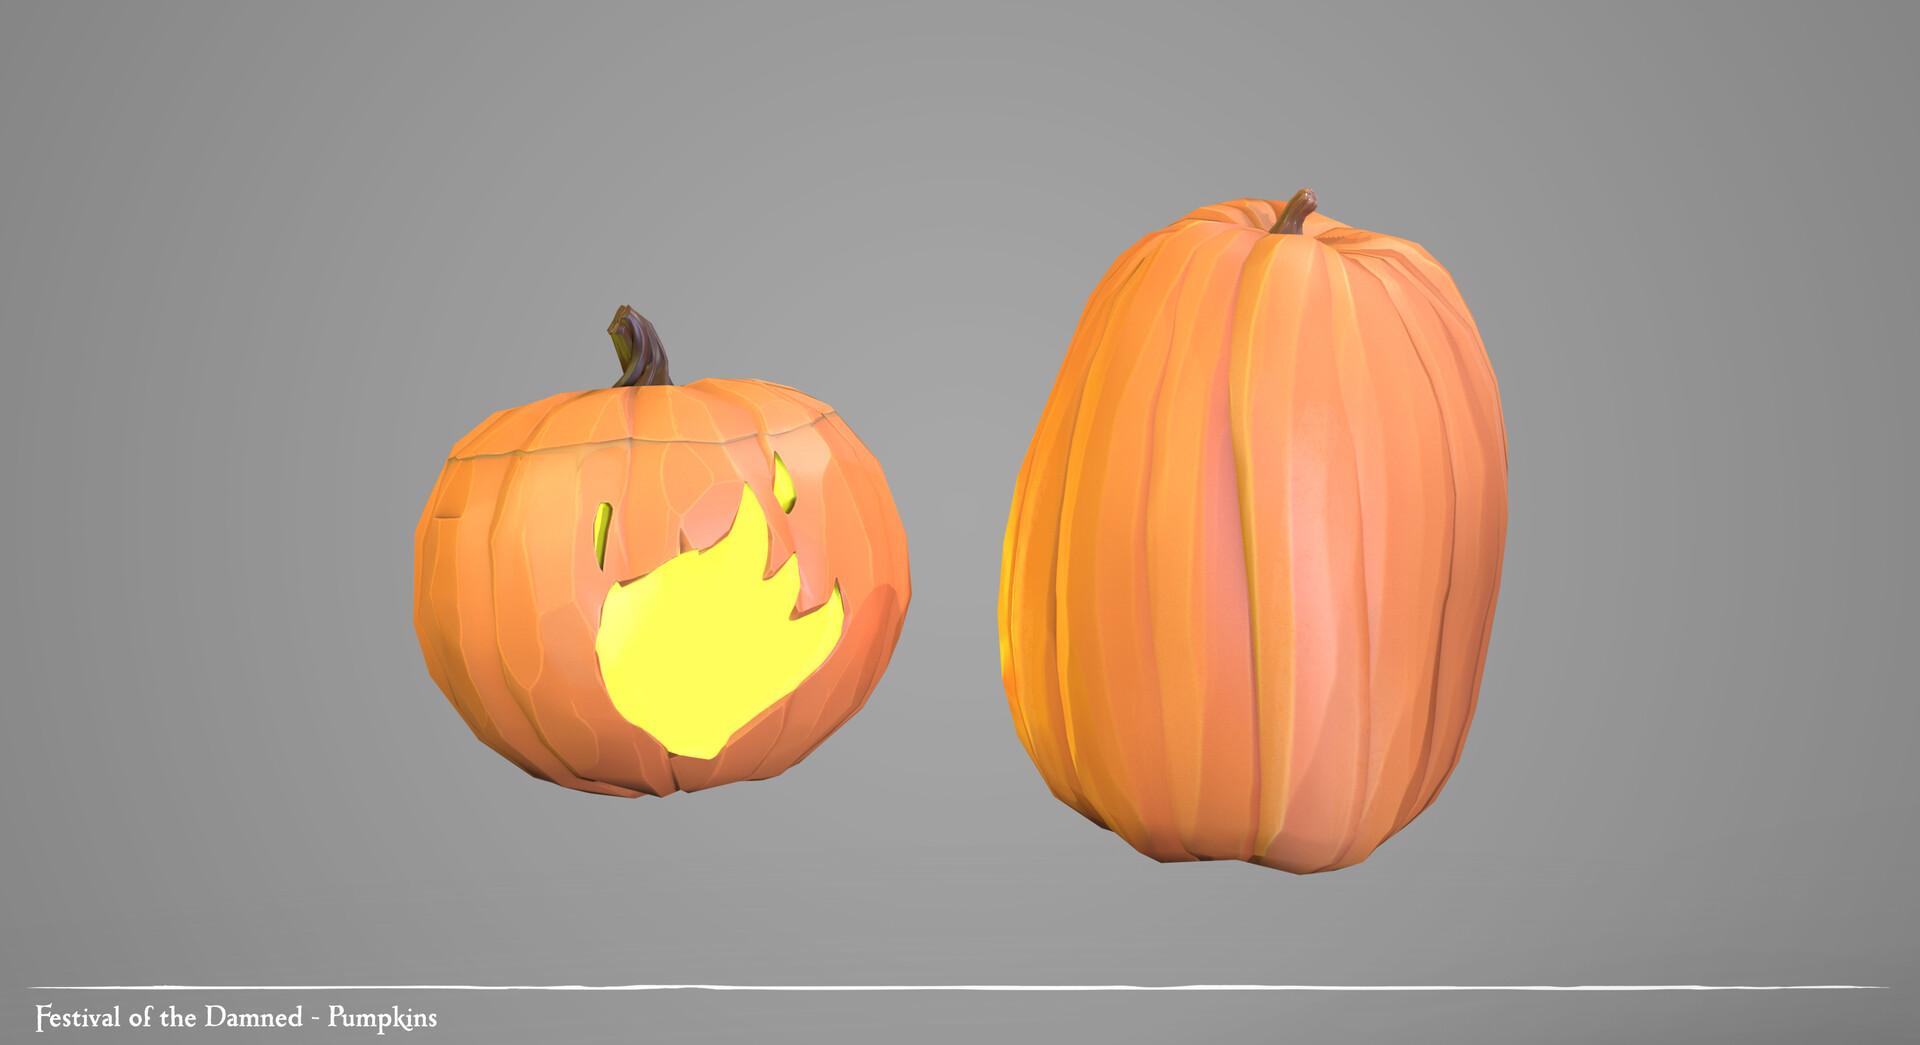 george-o-keeffe-07-fod-pumpkins.jpg